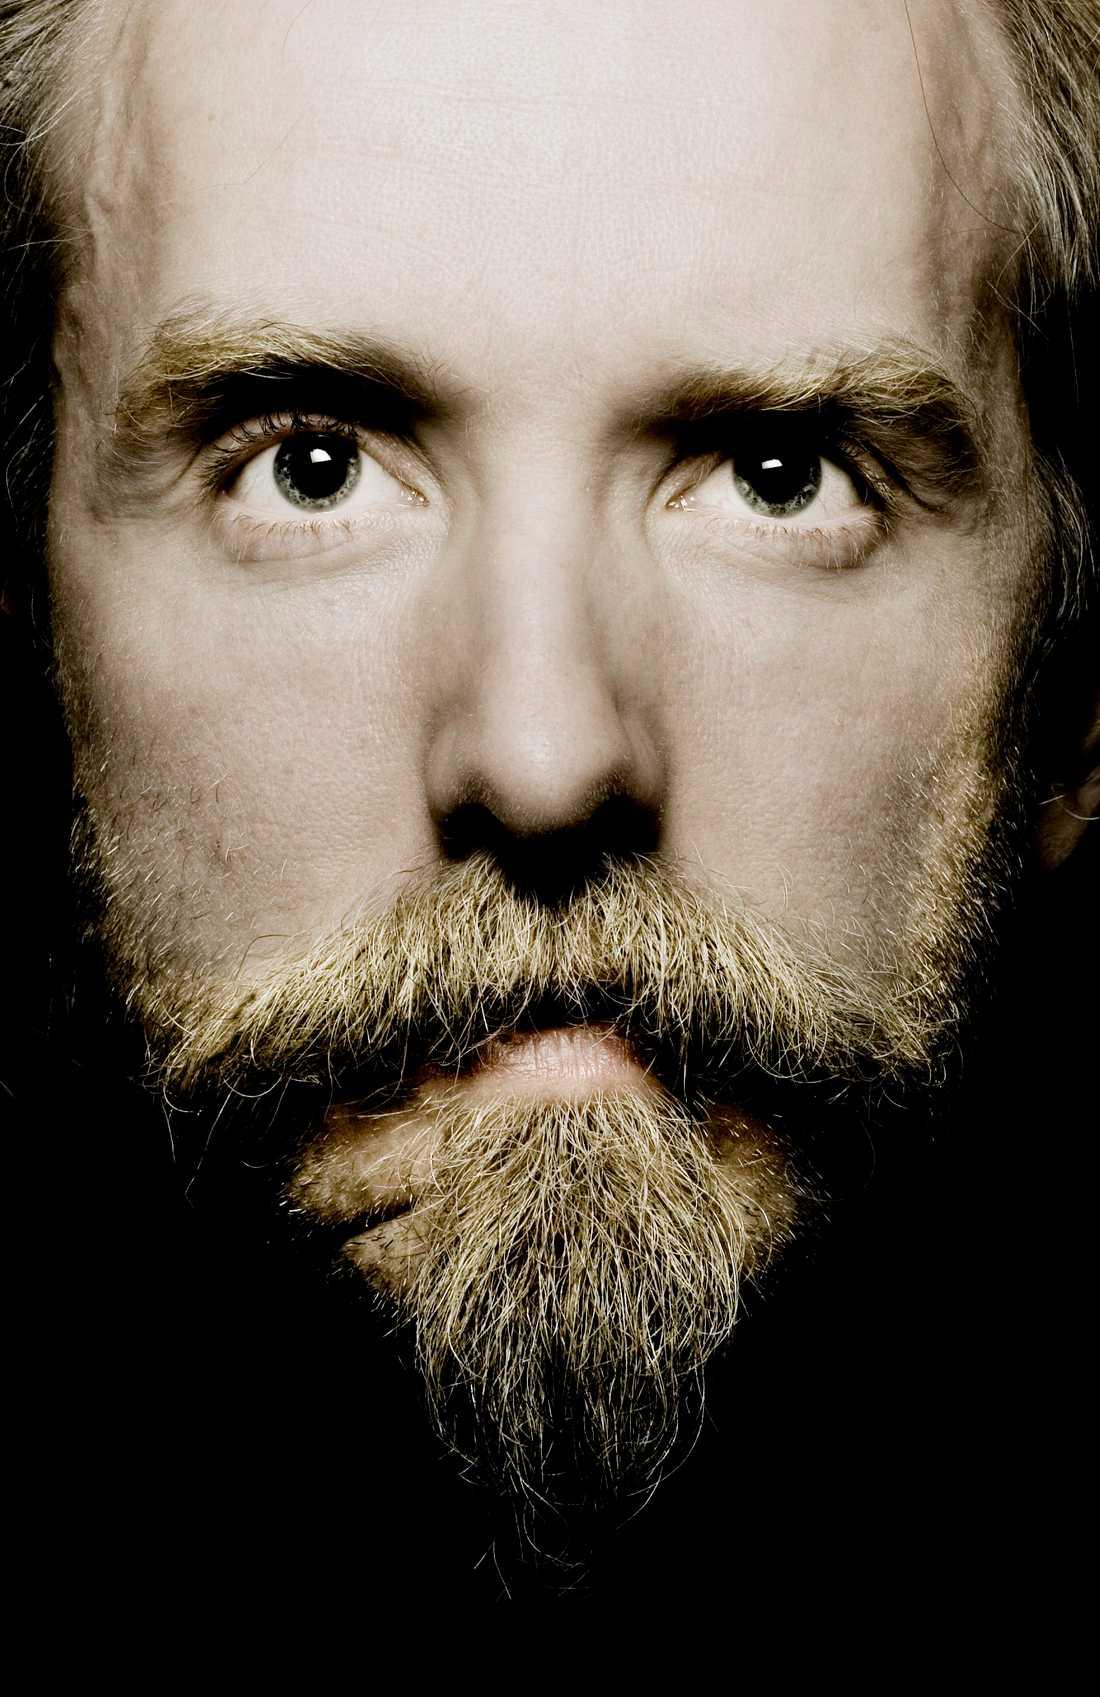 Under fängelsetiden fortsatte Vikernes att ge ut skivor under namnet Burzum.